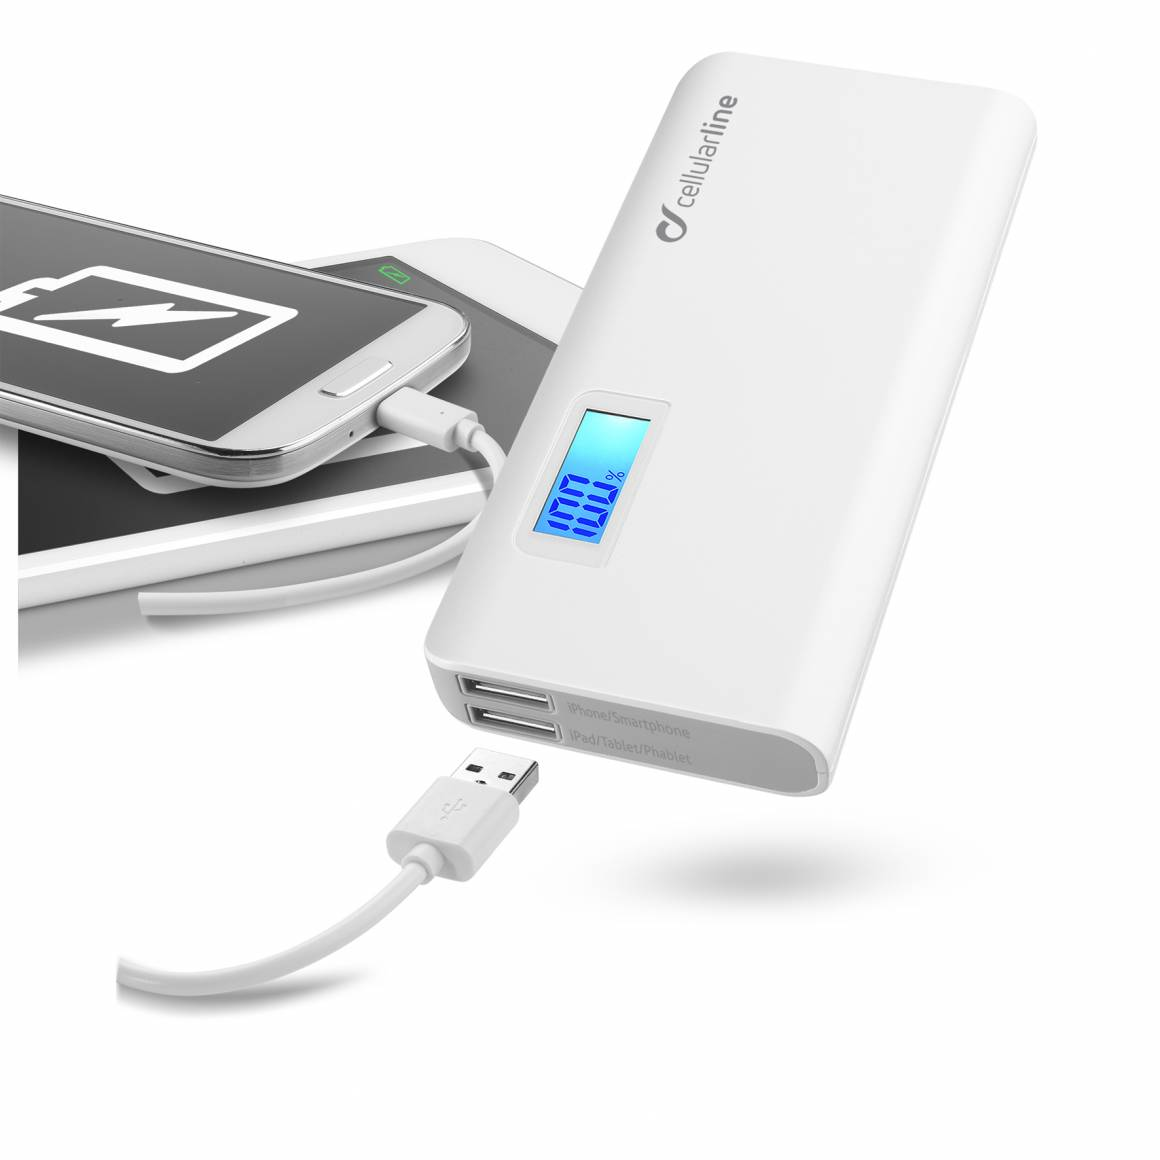 FREEPMULTI10000W 01 MAIN HR 1160x1160 - Caricabatterie portatili per più dispositivi